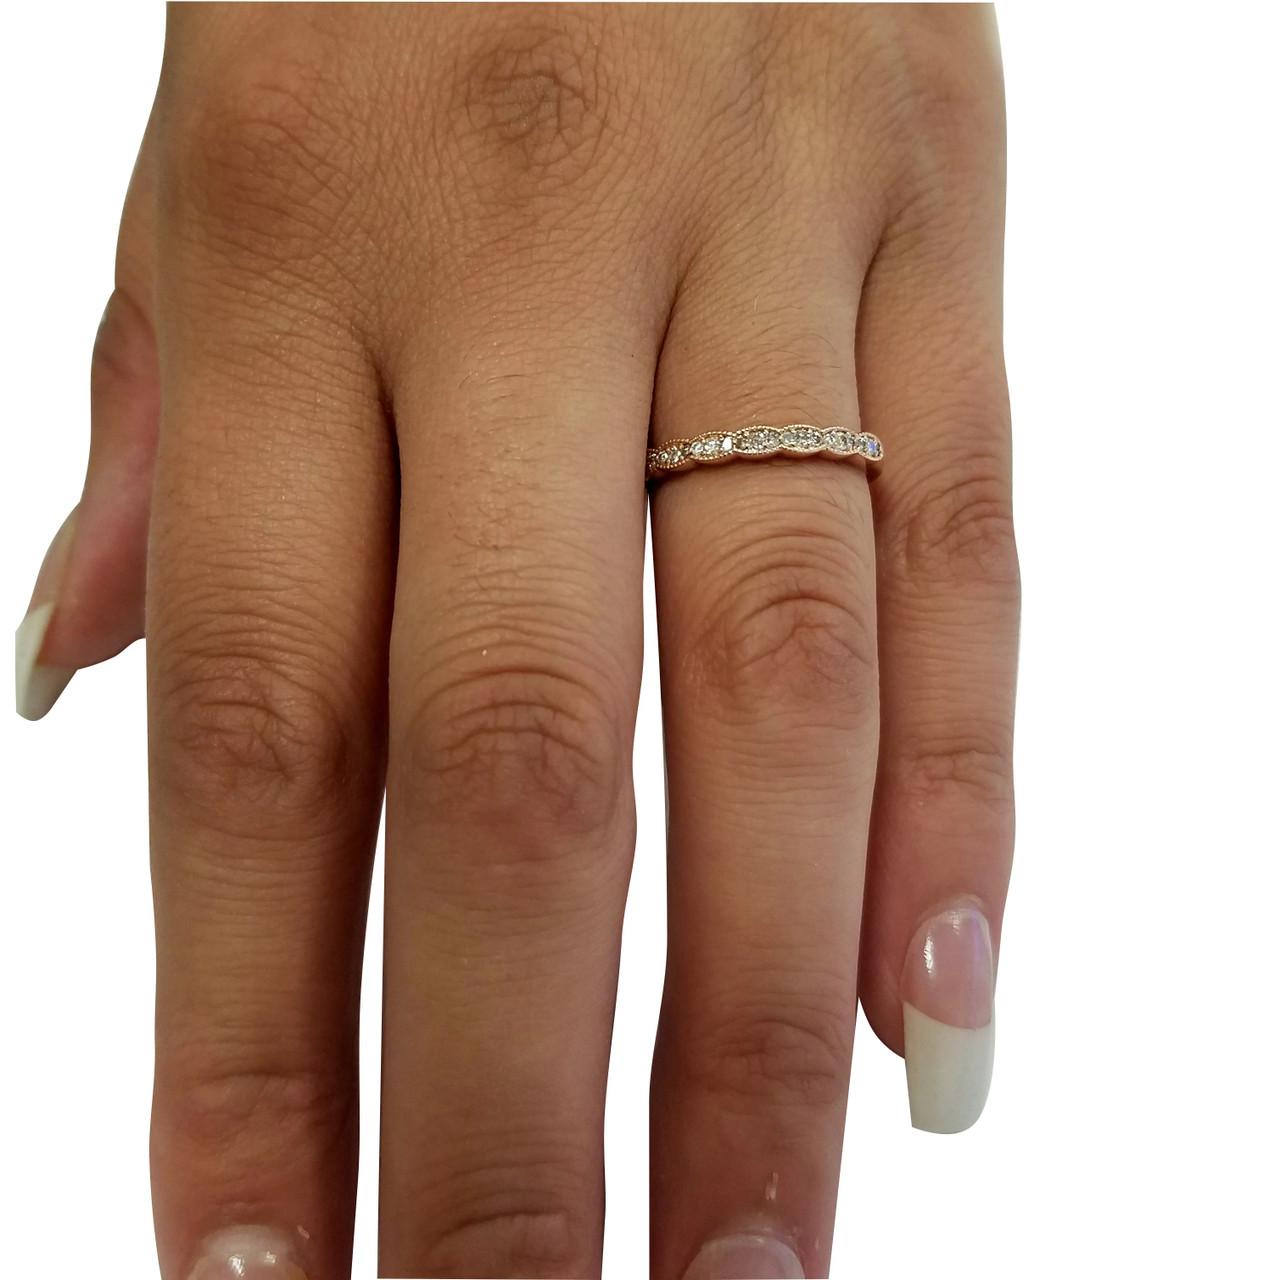 1 5 Cttw Diamond Stackable Womens Wedding Ring 14k Rose Gold